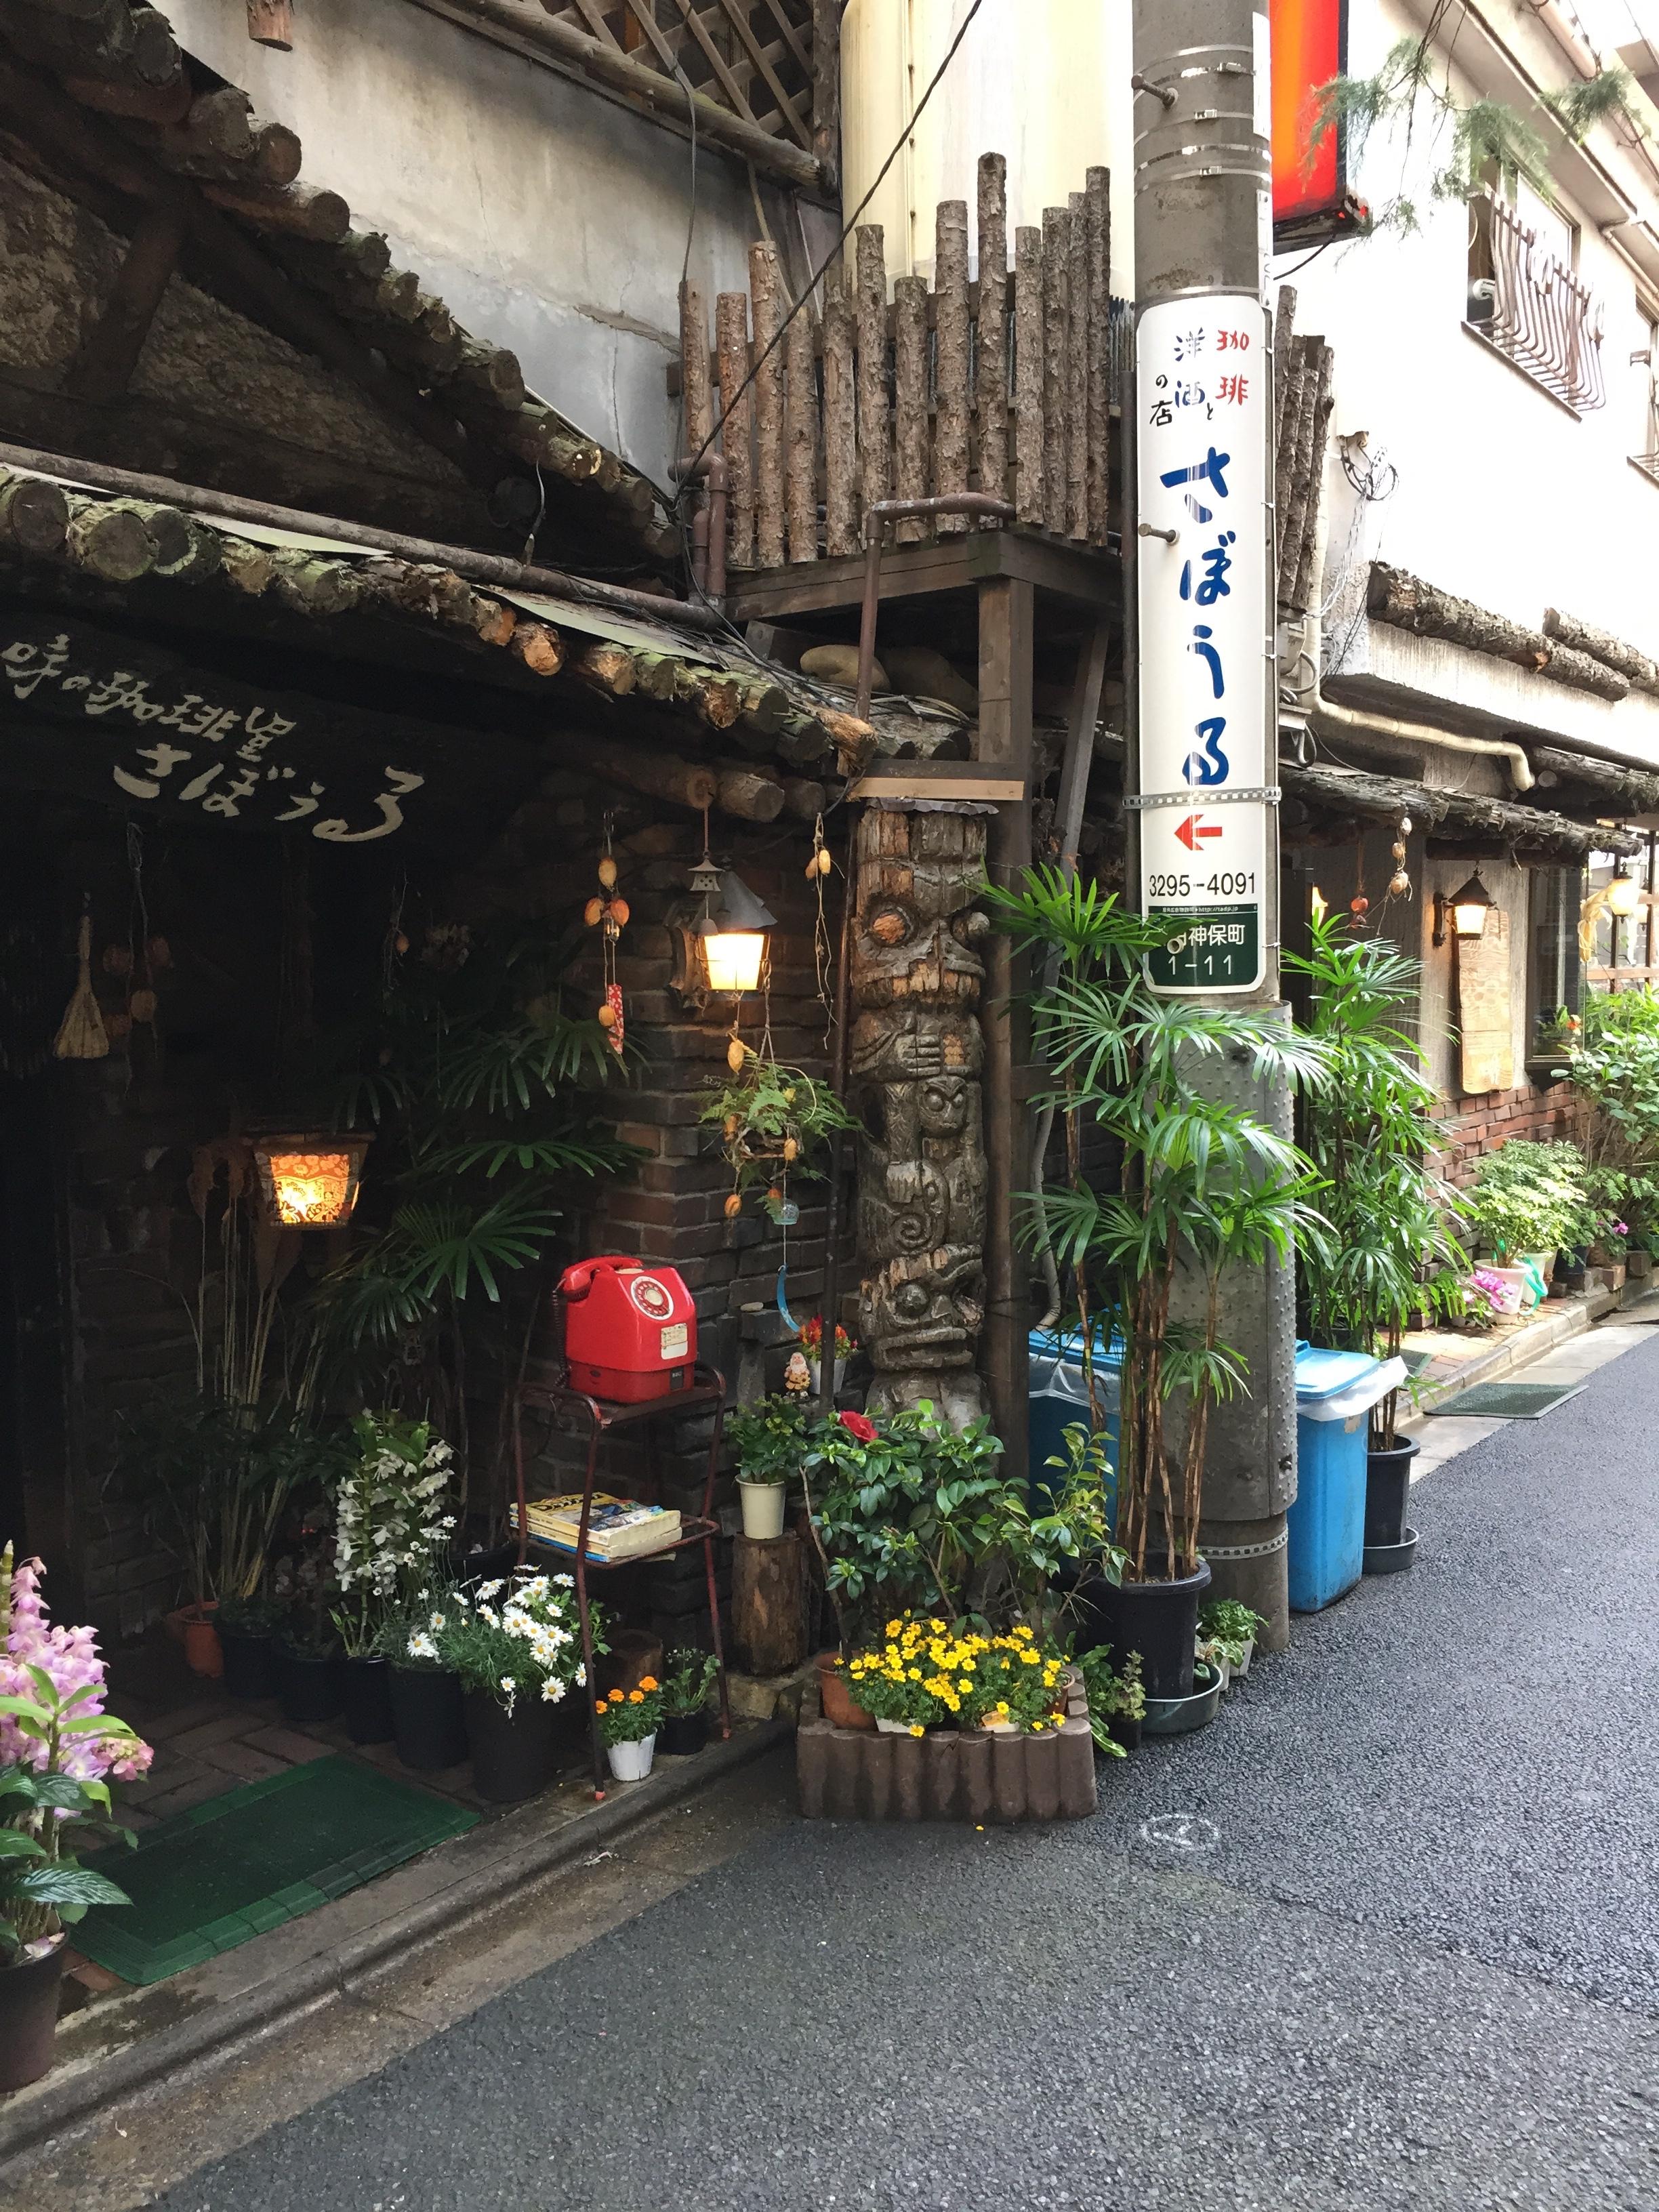 http://ud.t.u-tokyo.ac.jp/news/_images/IMG_4732.jpg